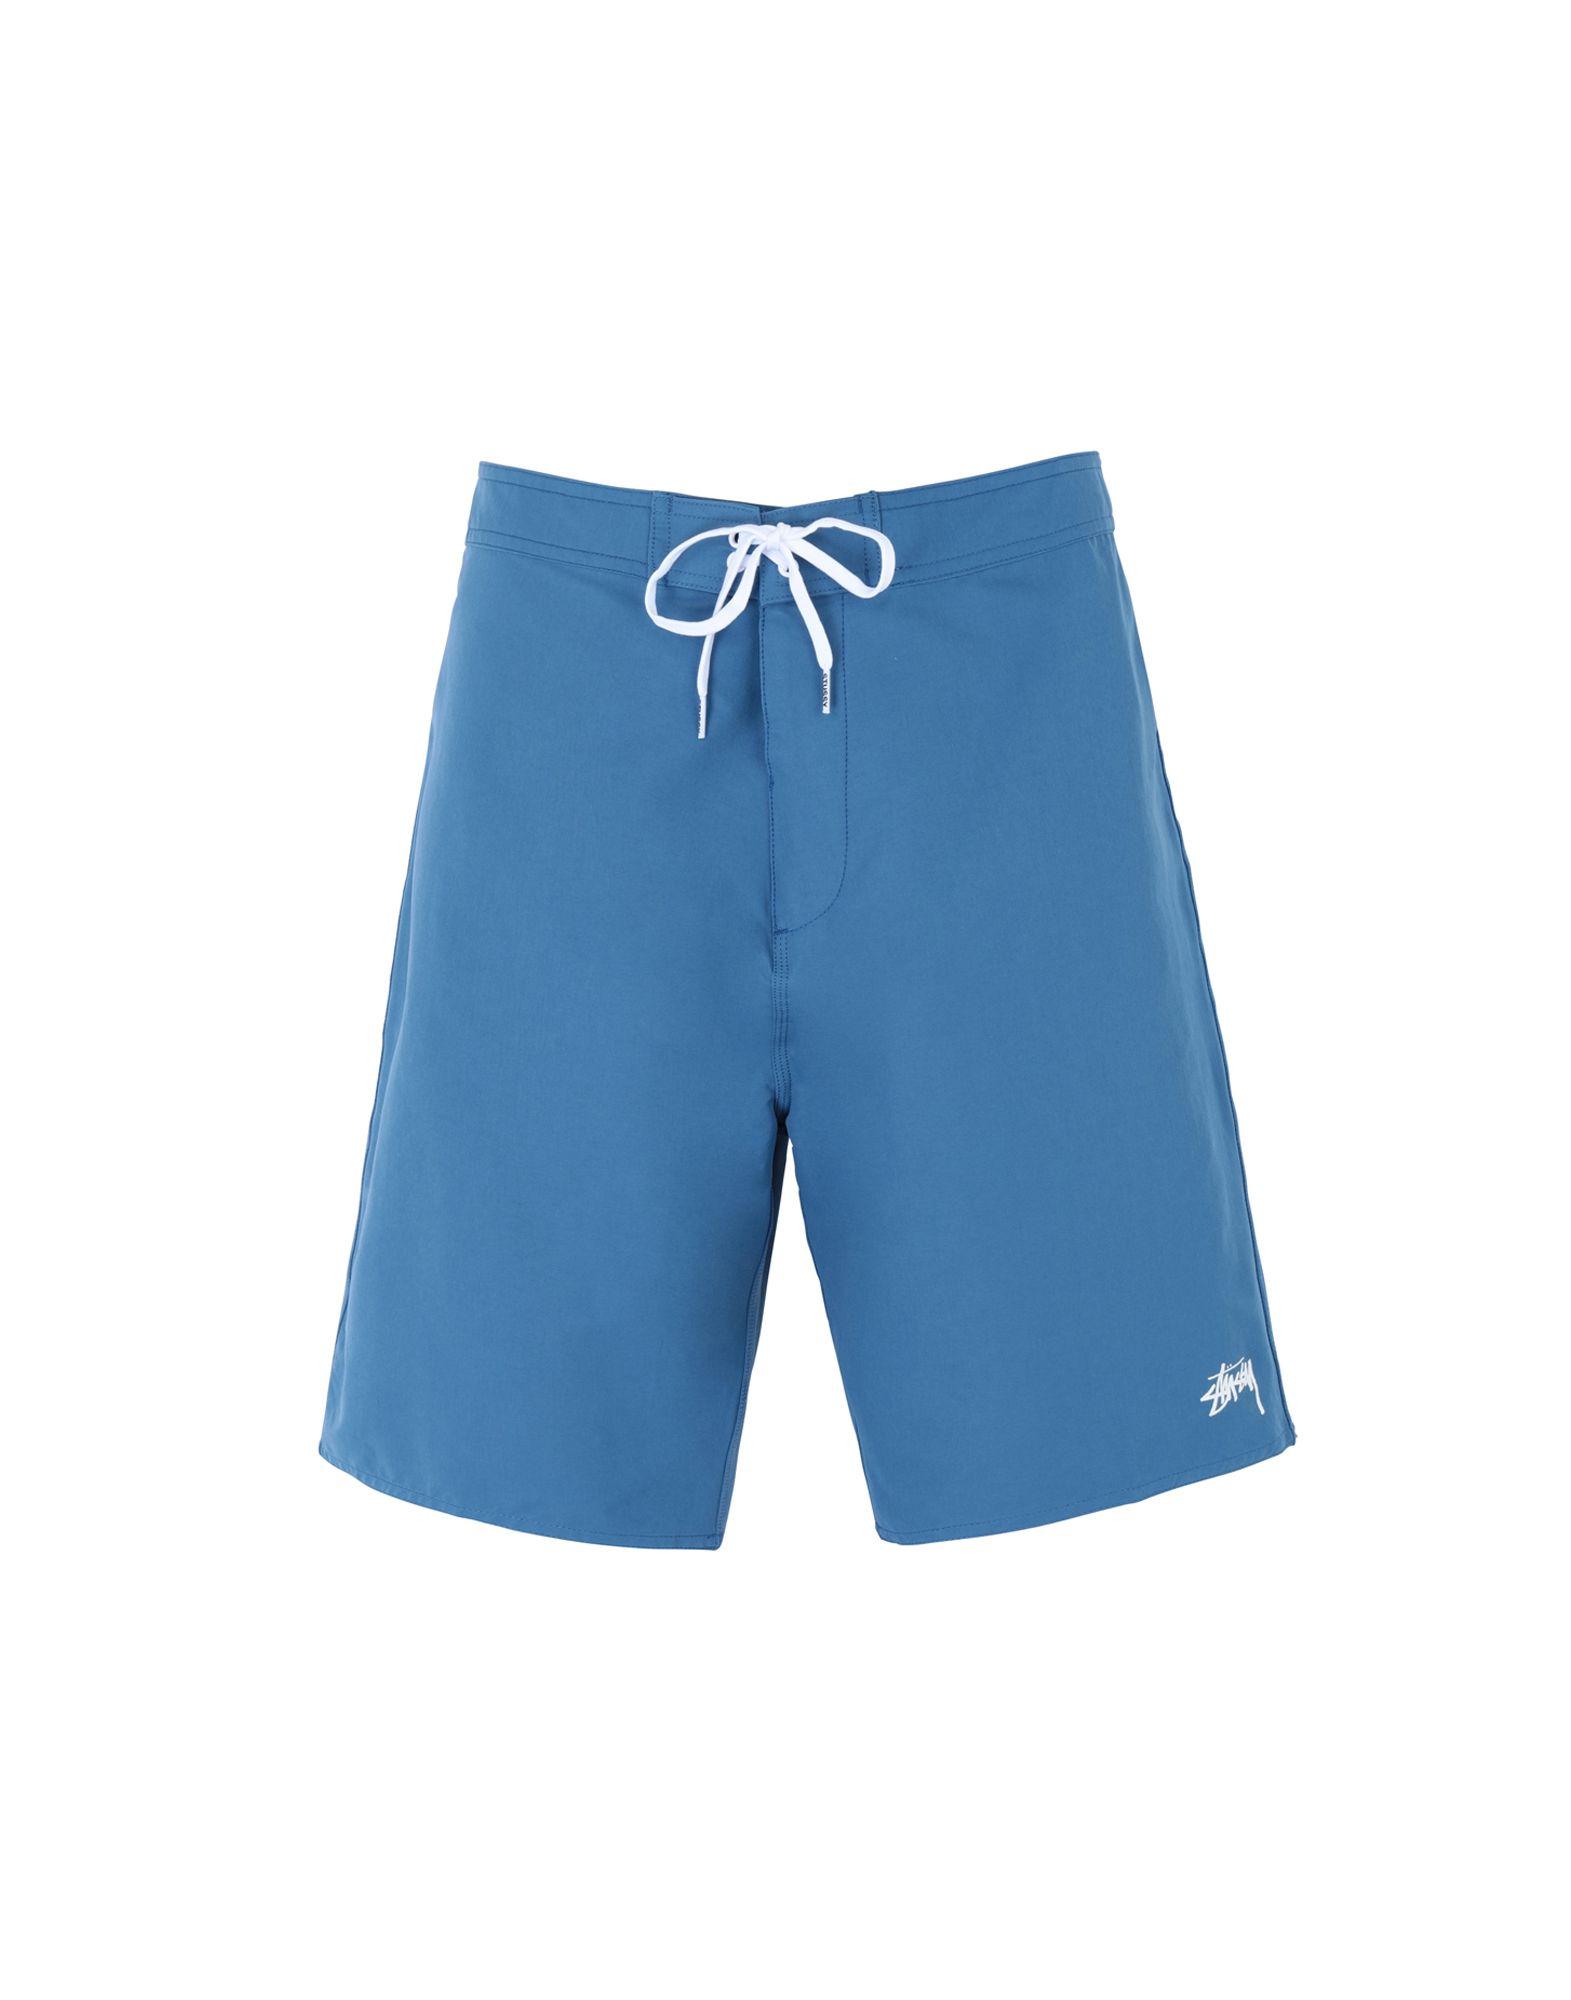 STUSSY Пляжные брюки и шорты шорты пляжные женские stussy black hawaii shorts black